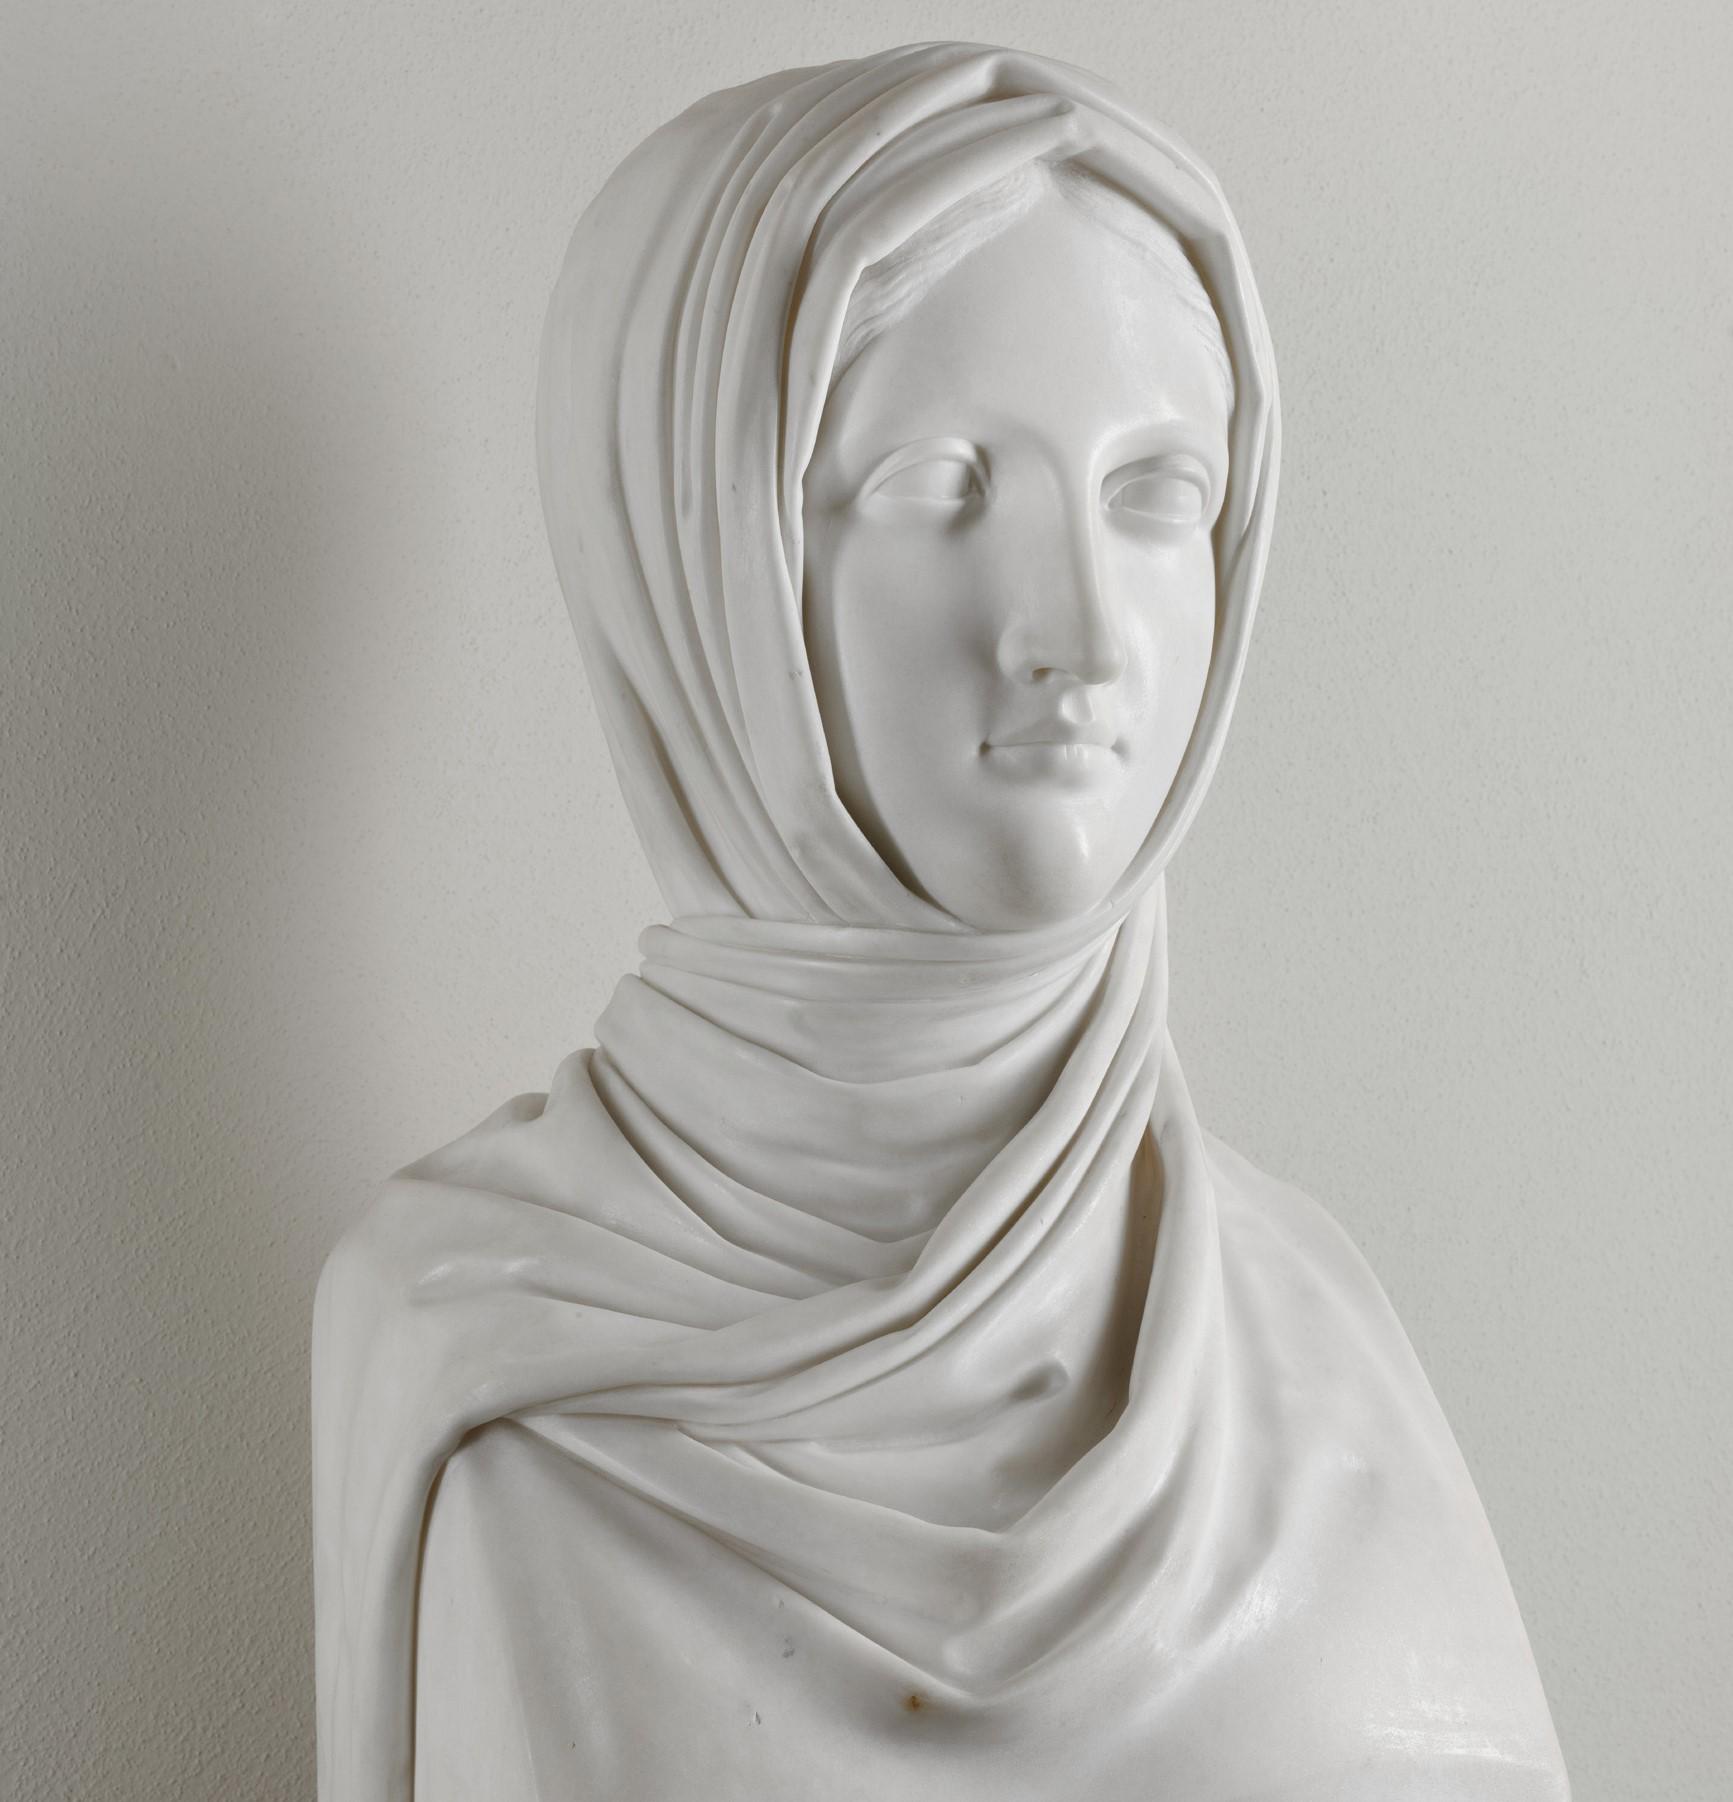 Canova, Vestale, 1818-1819, Milano, Galleria di Arte Moderna.